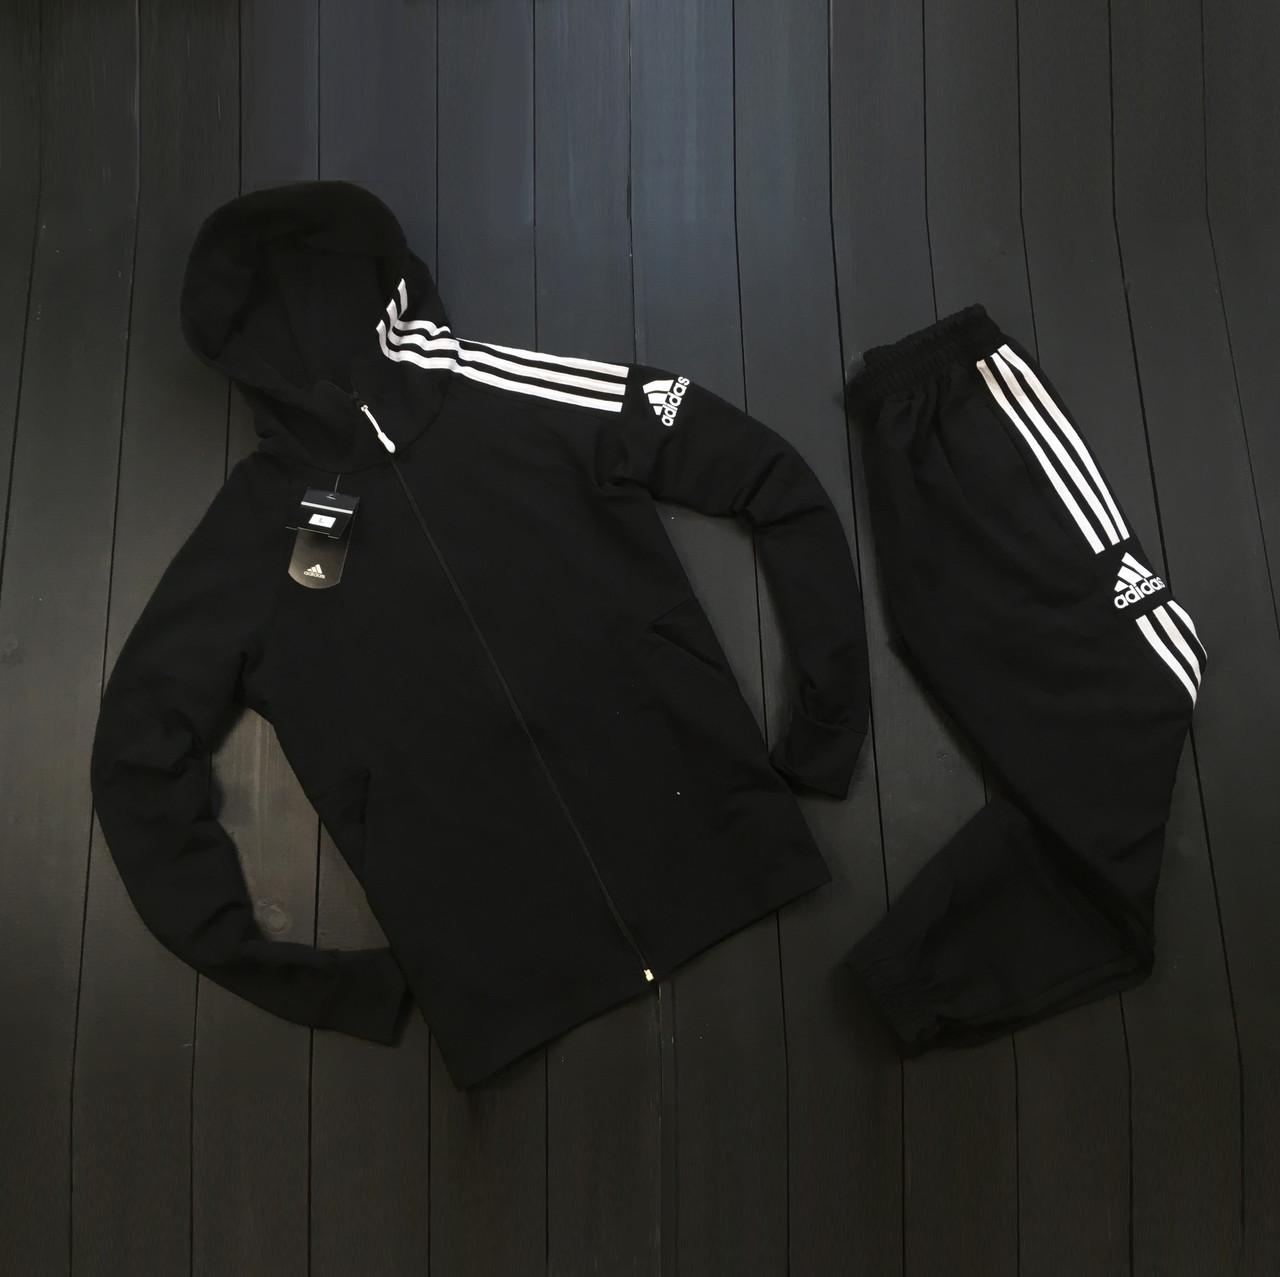 Мужской весенний костюм Adidas (black/white), спортивный костюм Адидас (Реплика ААА)